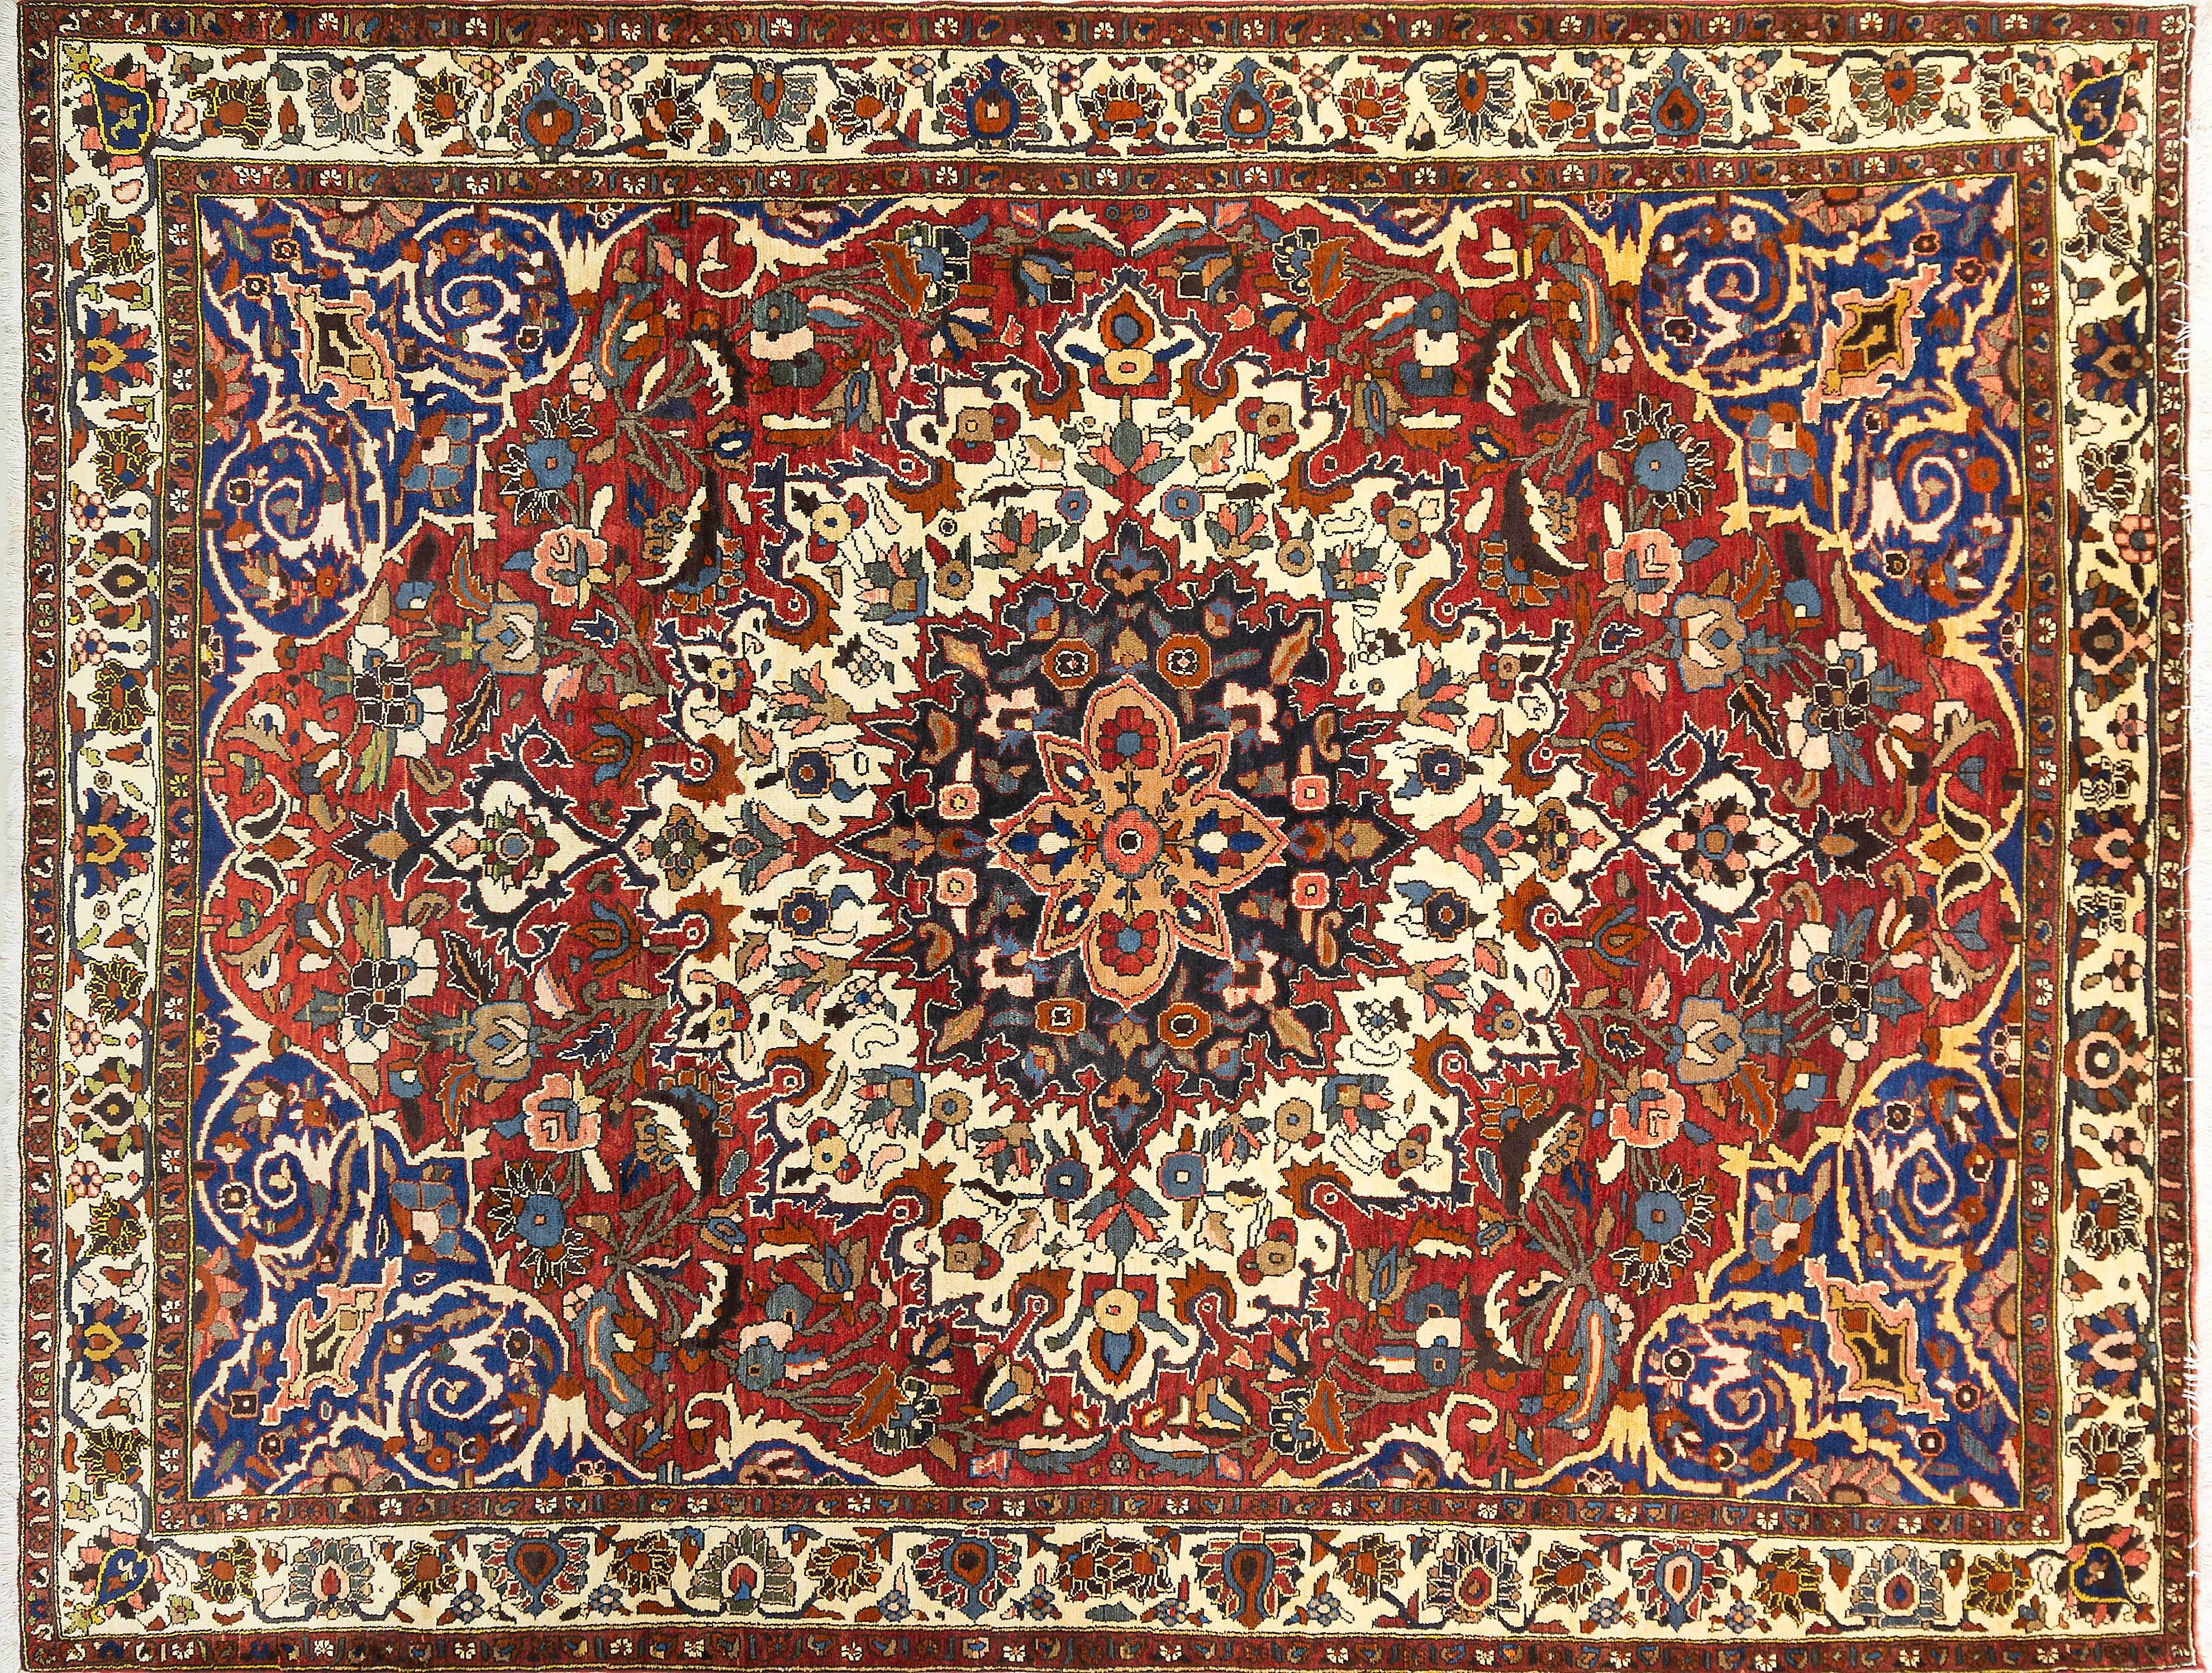 A Persian Hand Knotted Bakhtiari Carpet, 327 x 255